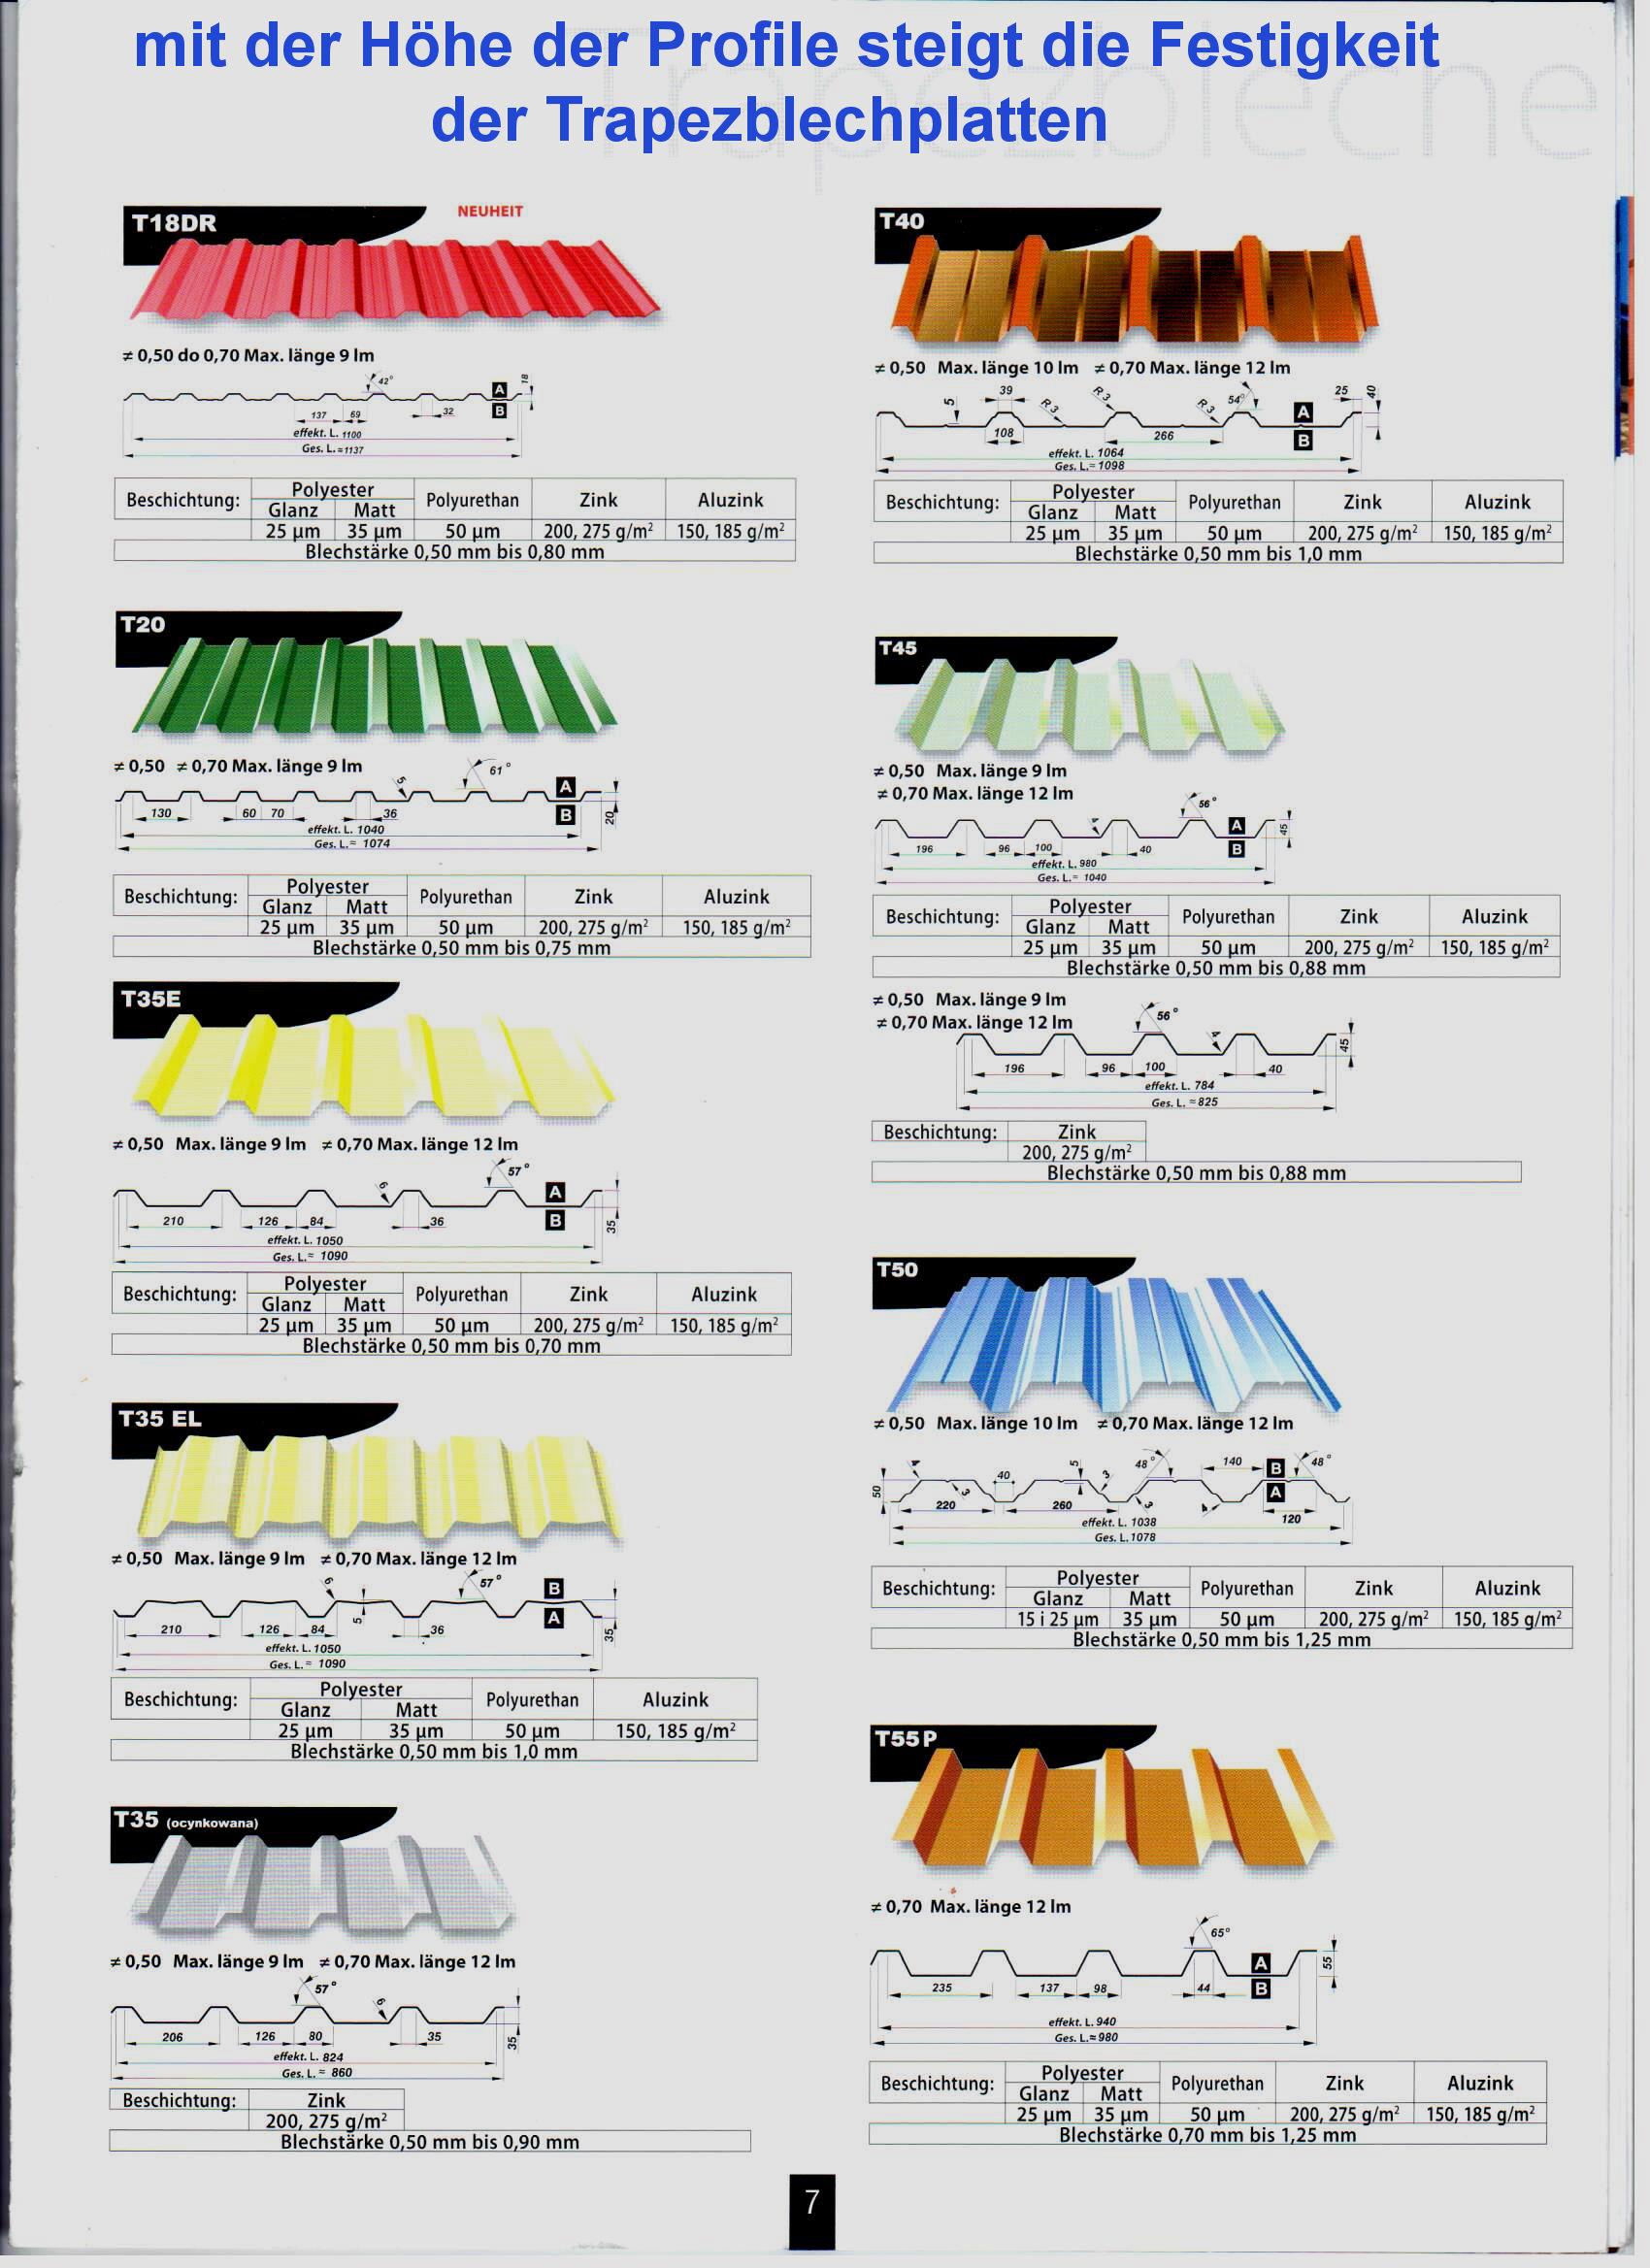 trapezblech stahlblech profil 35mm direkt v hersteller preis leistung hpm shop. Black Bedroom Furniture Sets. Home Design Ideas